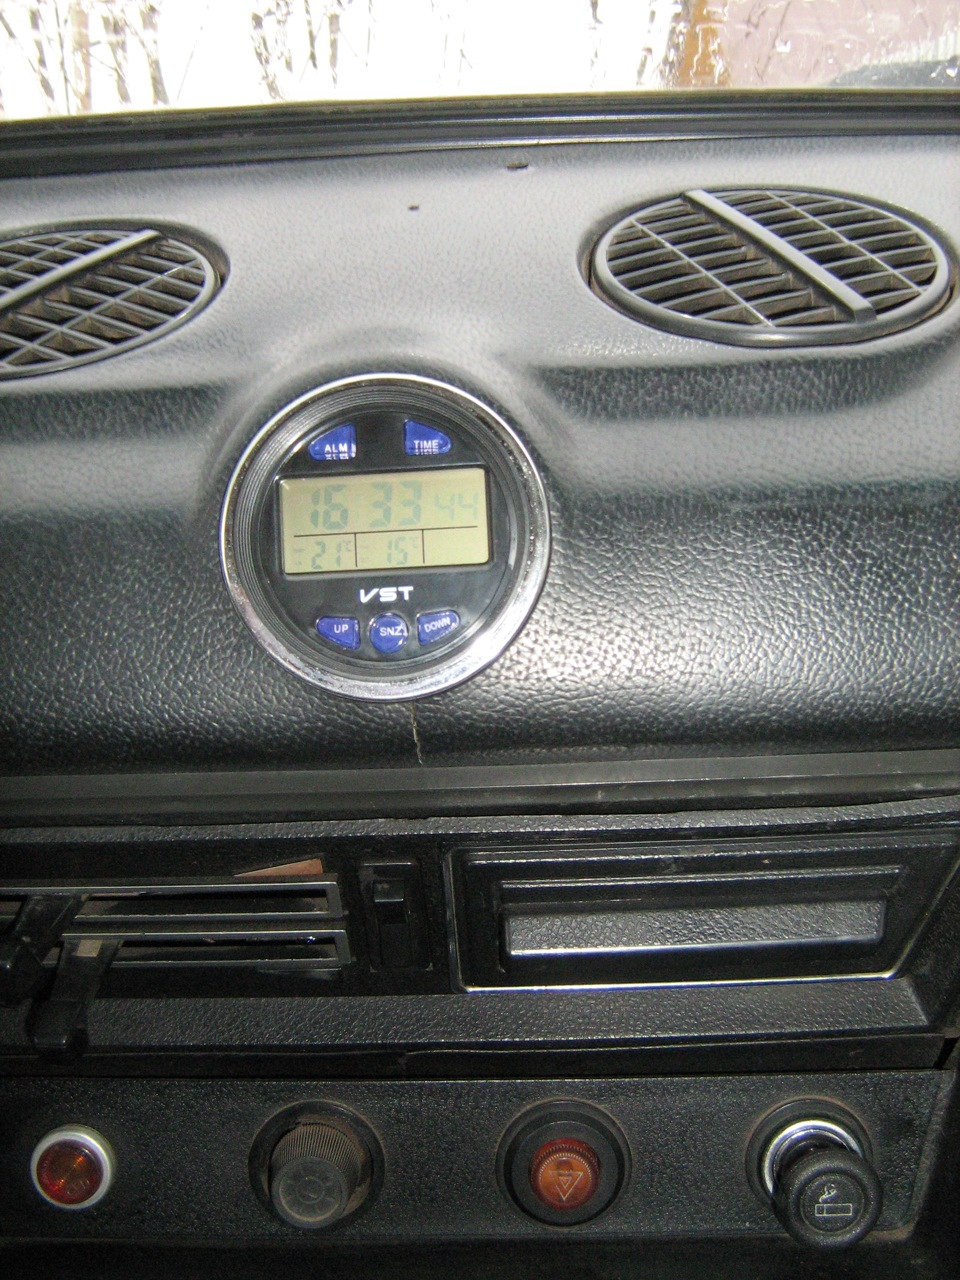 c189116s 960 - Электронные часы в ваз 2106